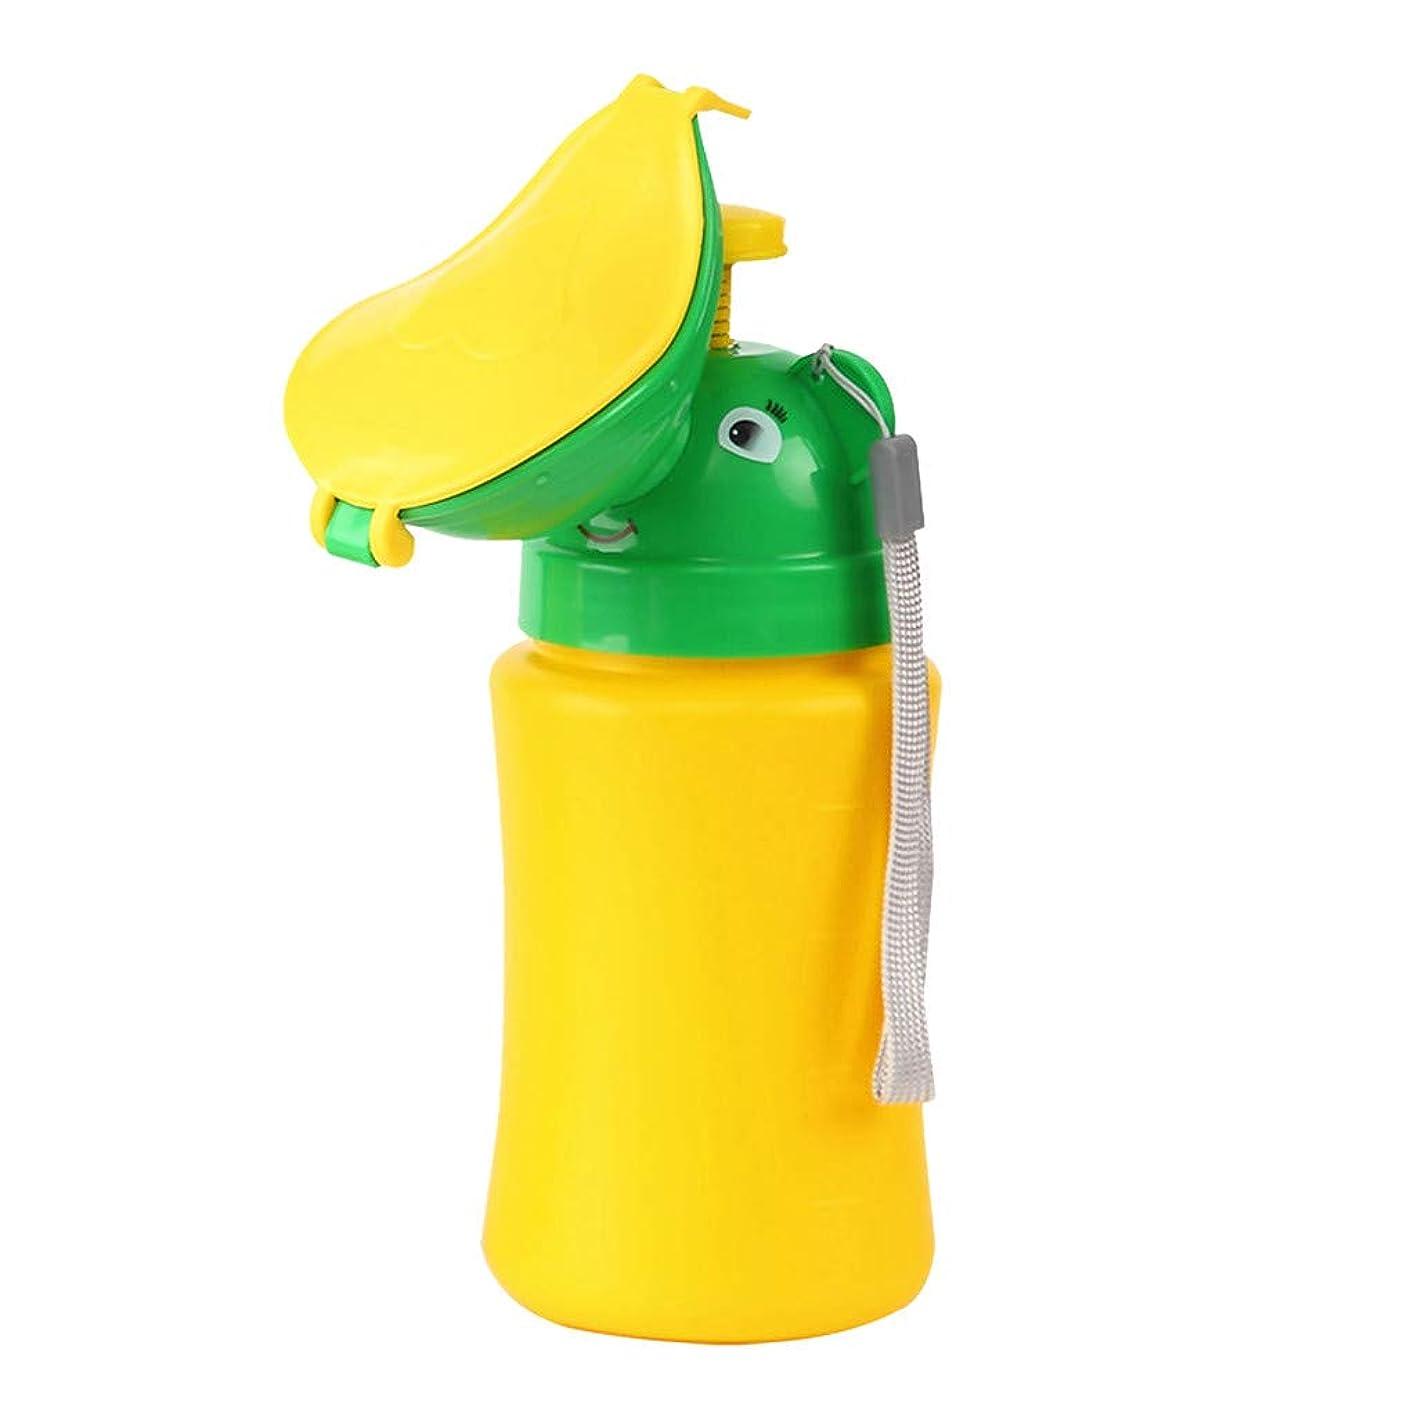 SUNBIBE Baby Boy&Girl Portable Potty?Urinal Emergency Toilet for Car Travel Pee Training pdpoaidrpru048